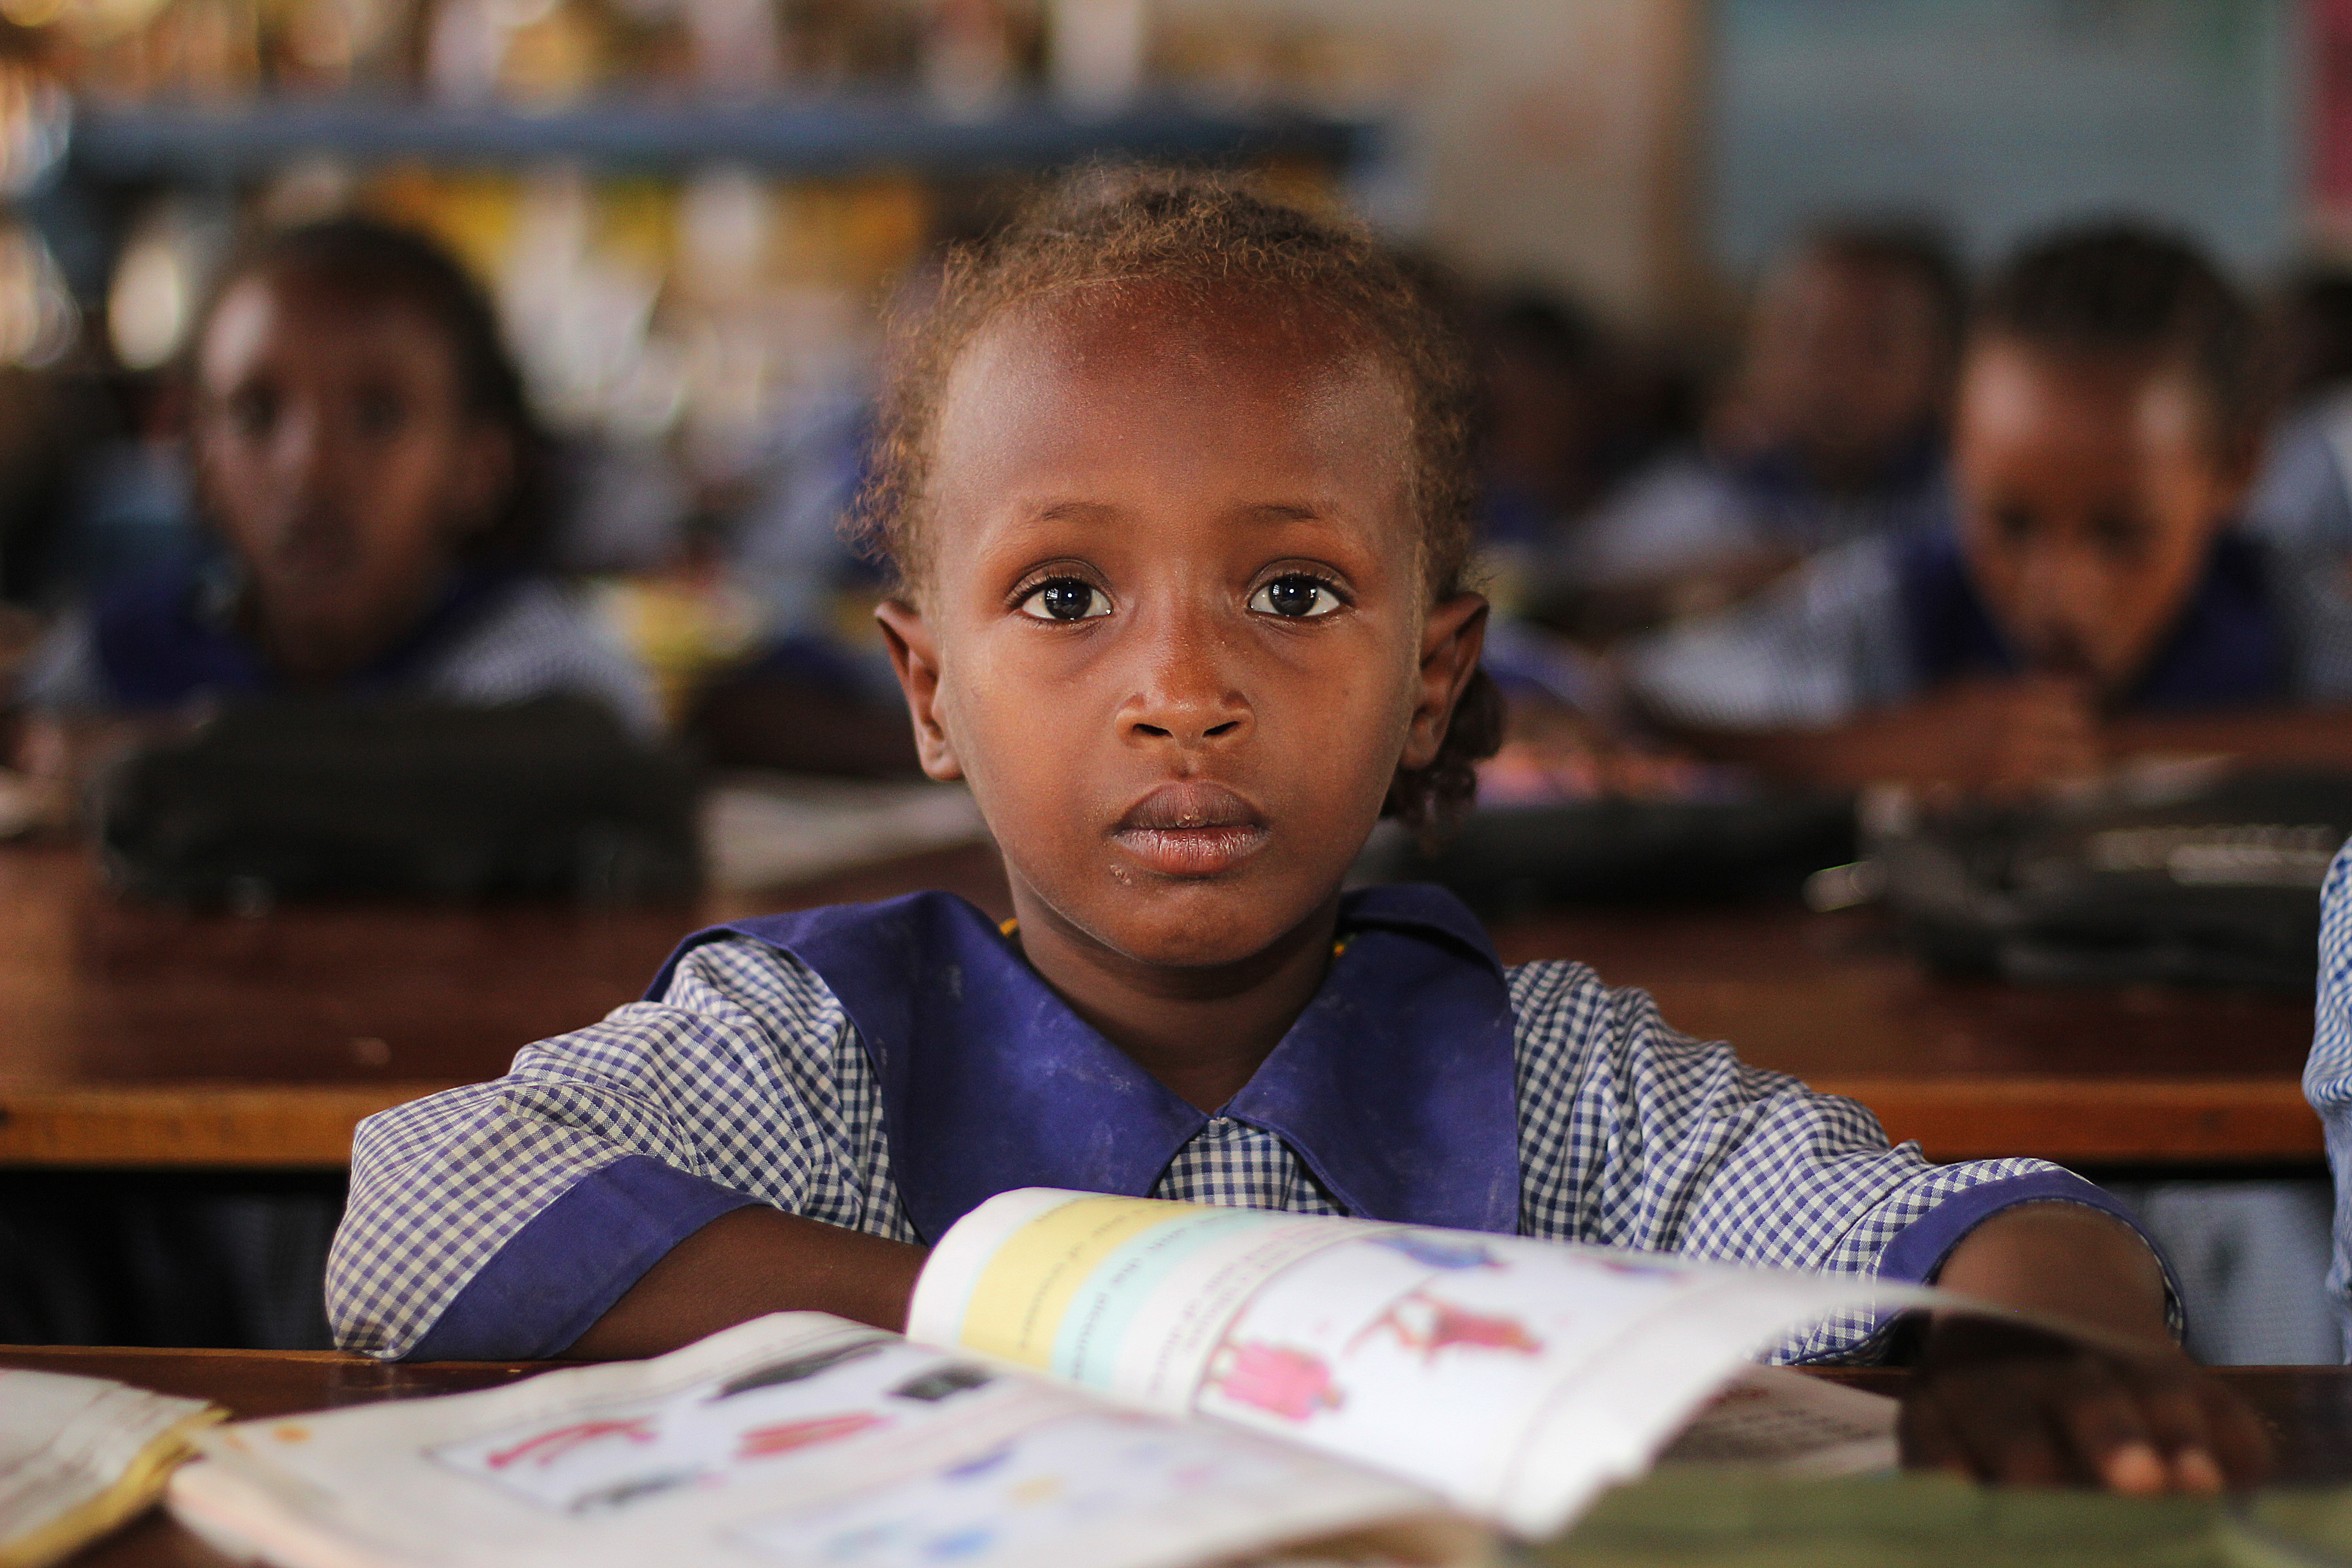 School girl in Kenya